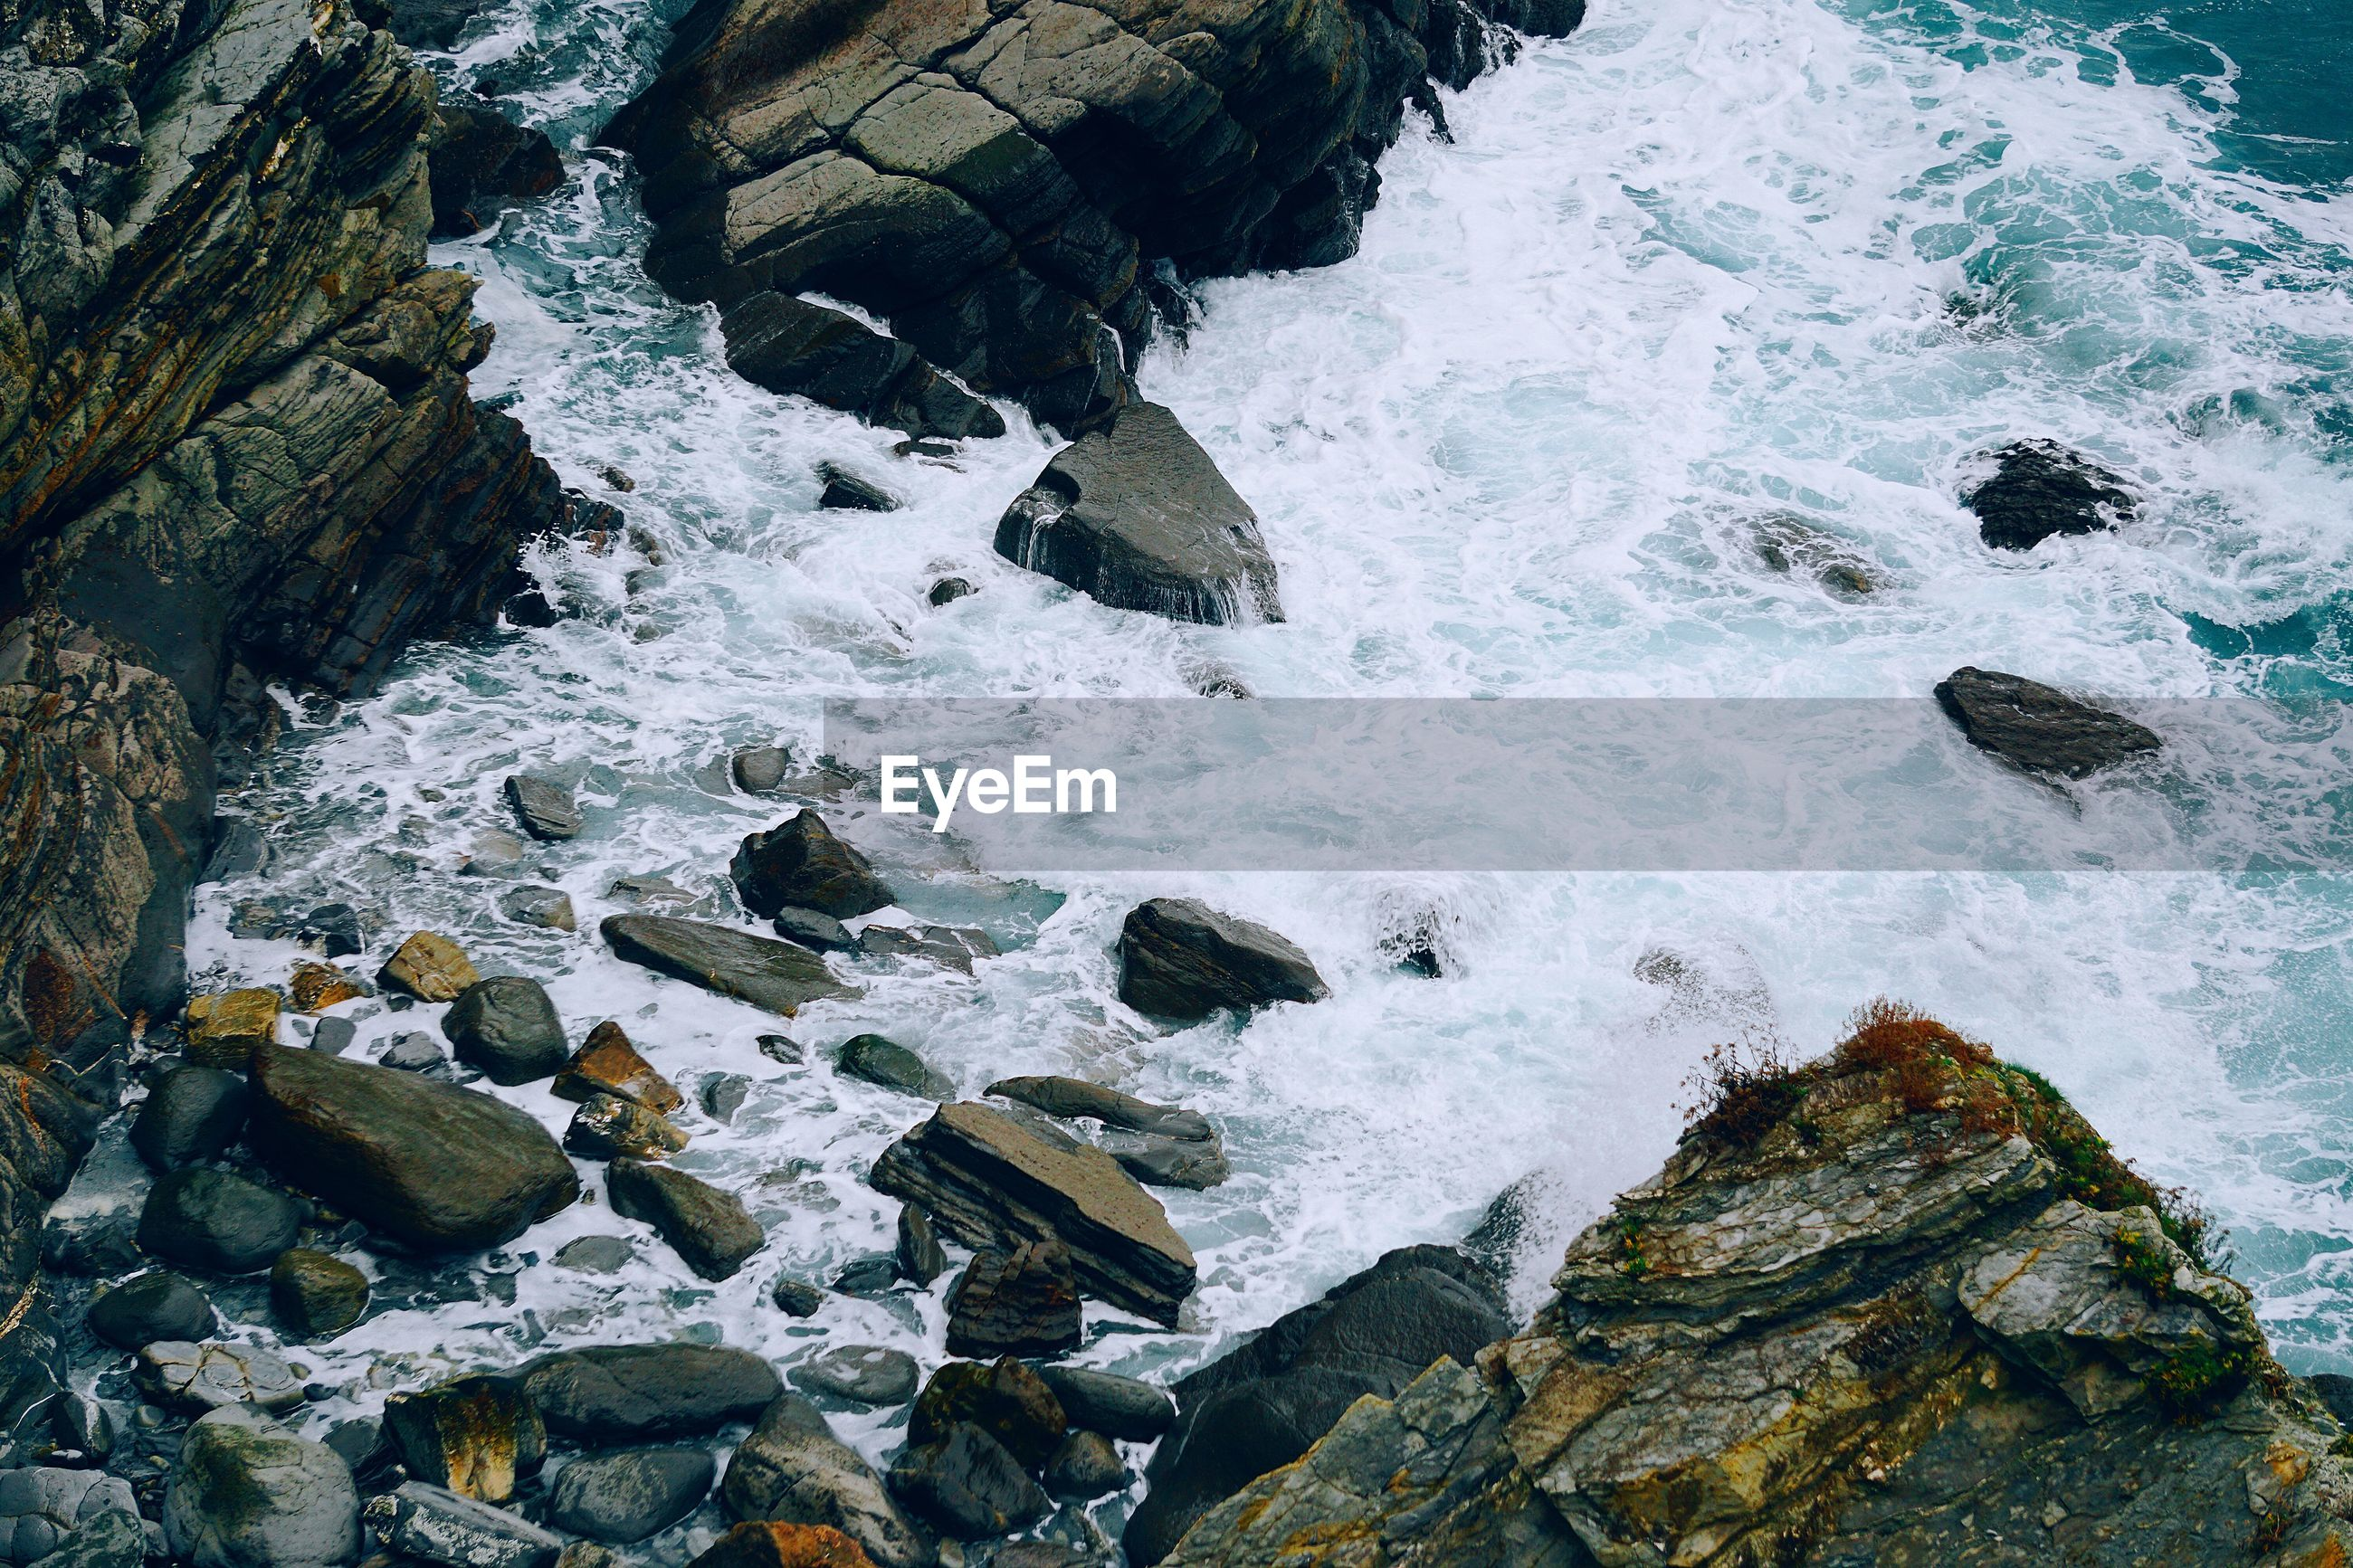 The rocks in the sea